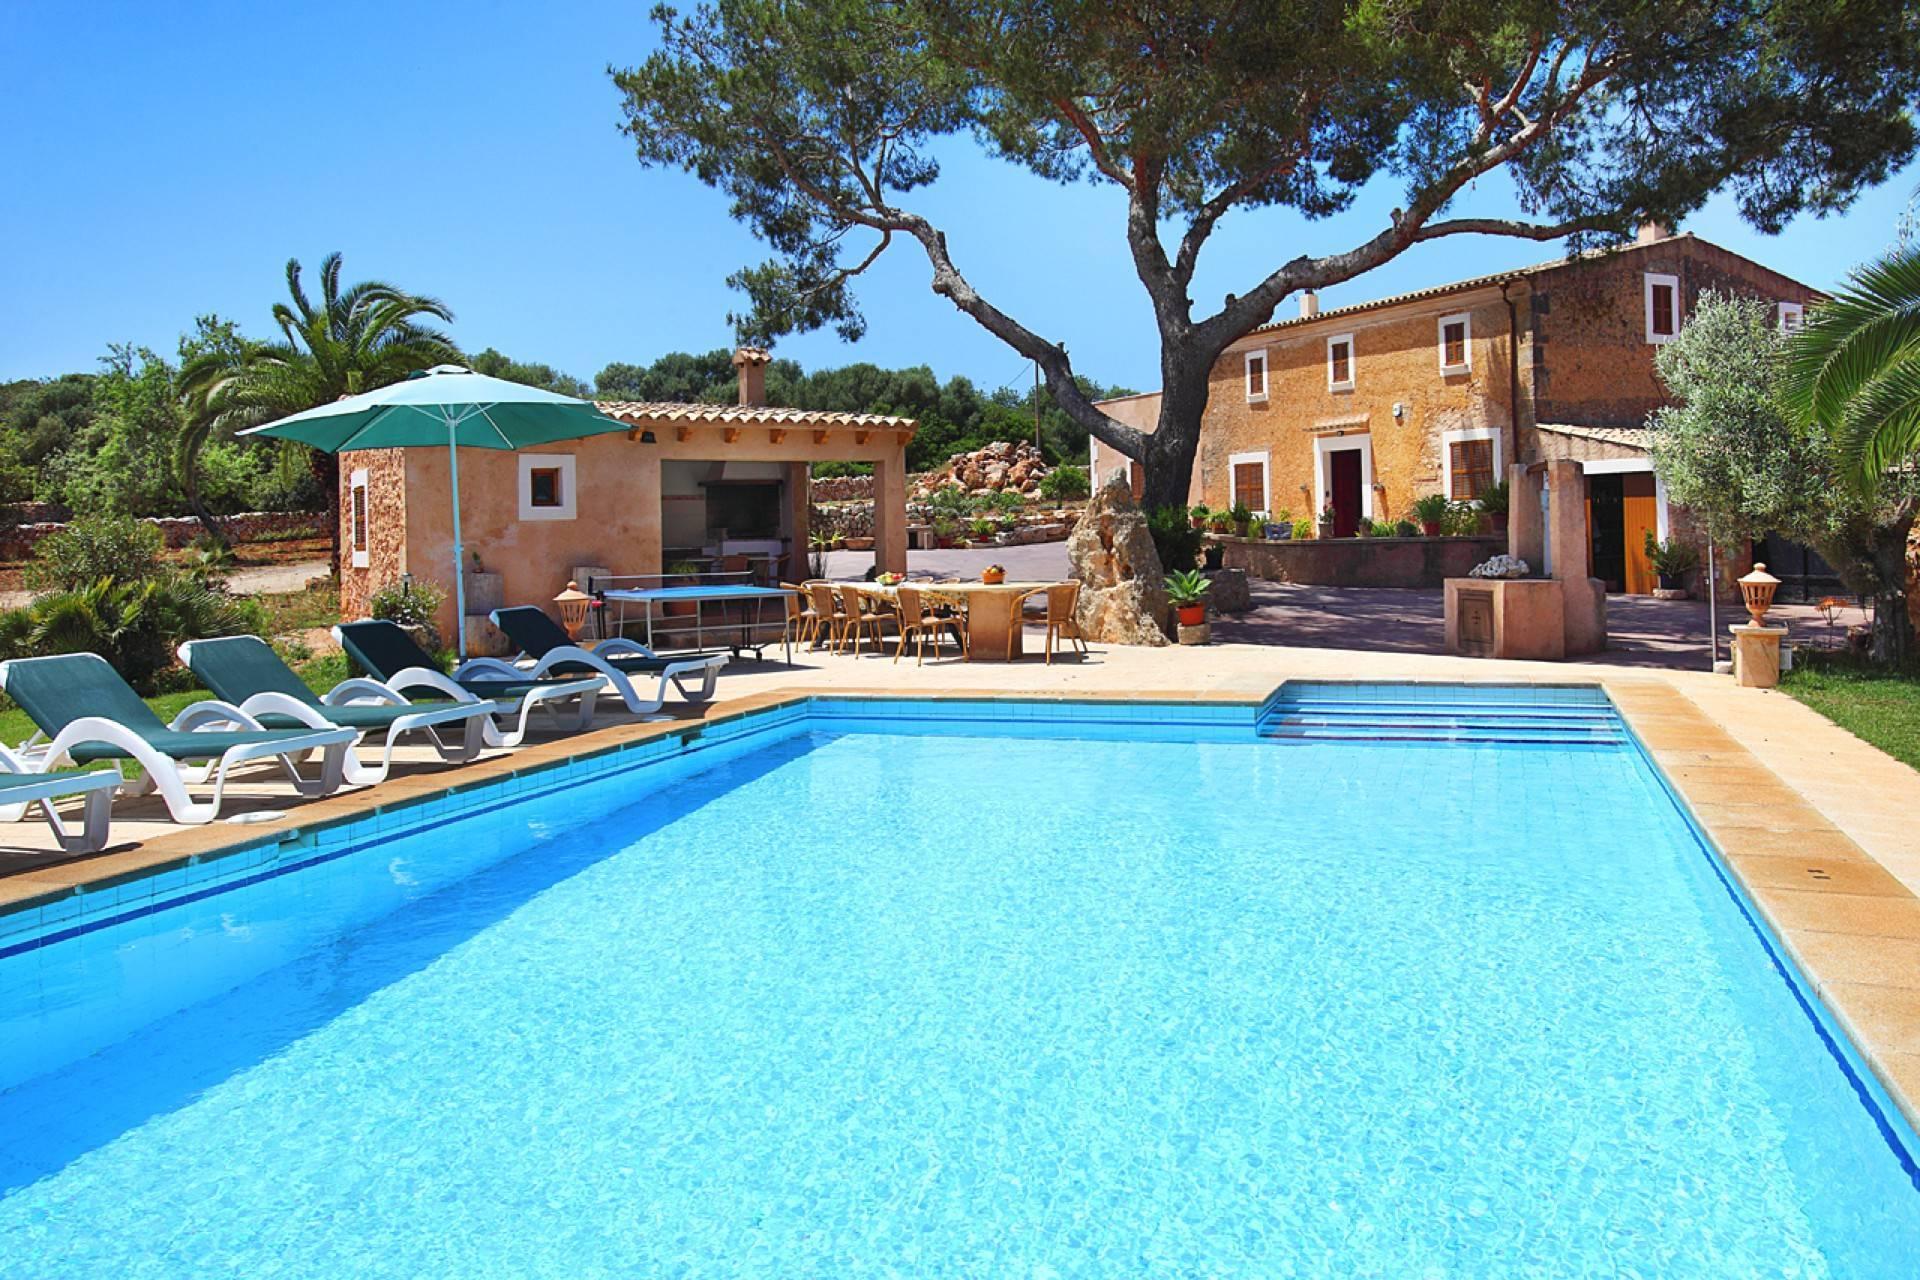 01-142 Rustic farmhouse Mallorca east Bild 1